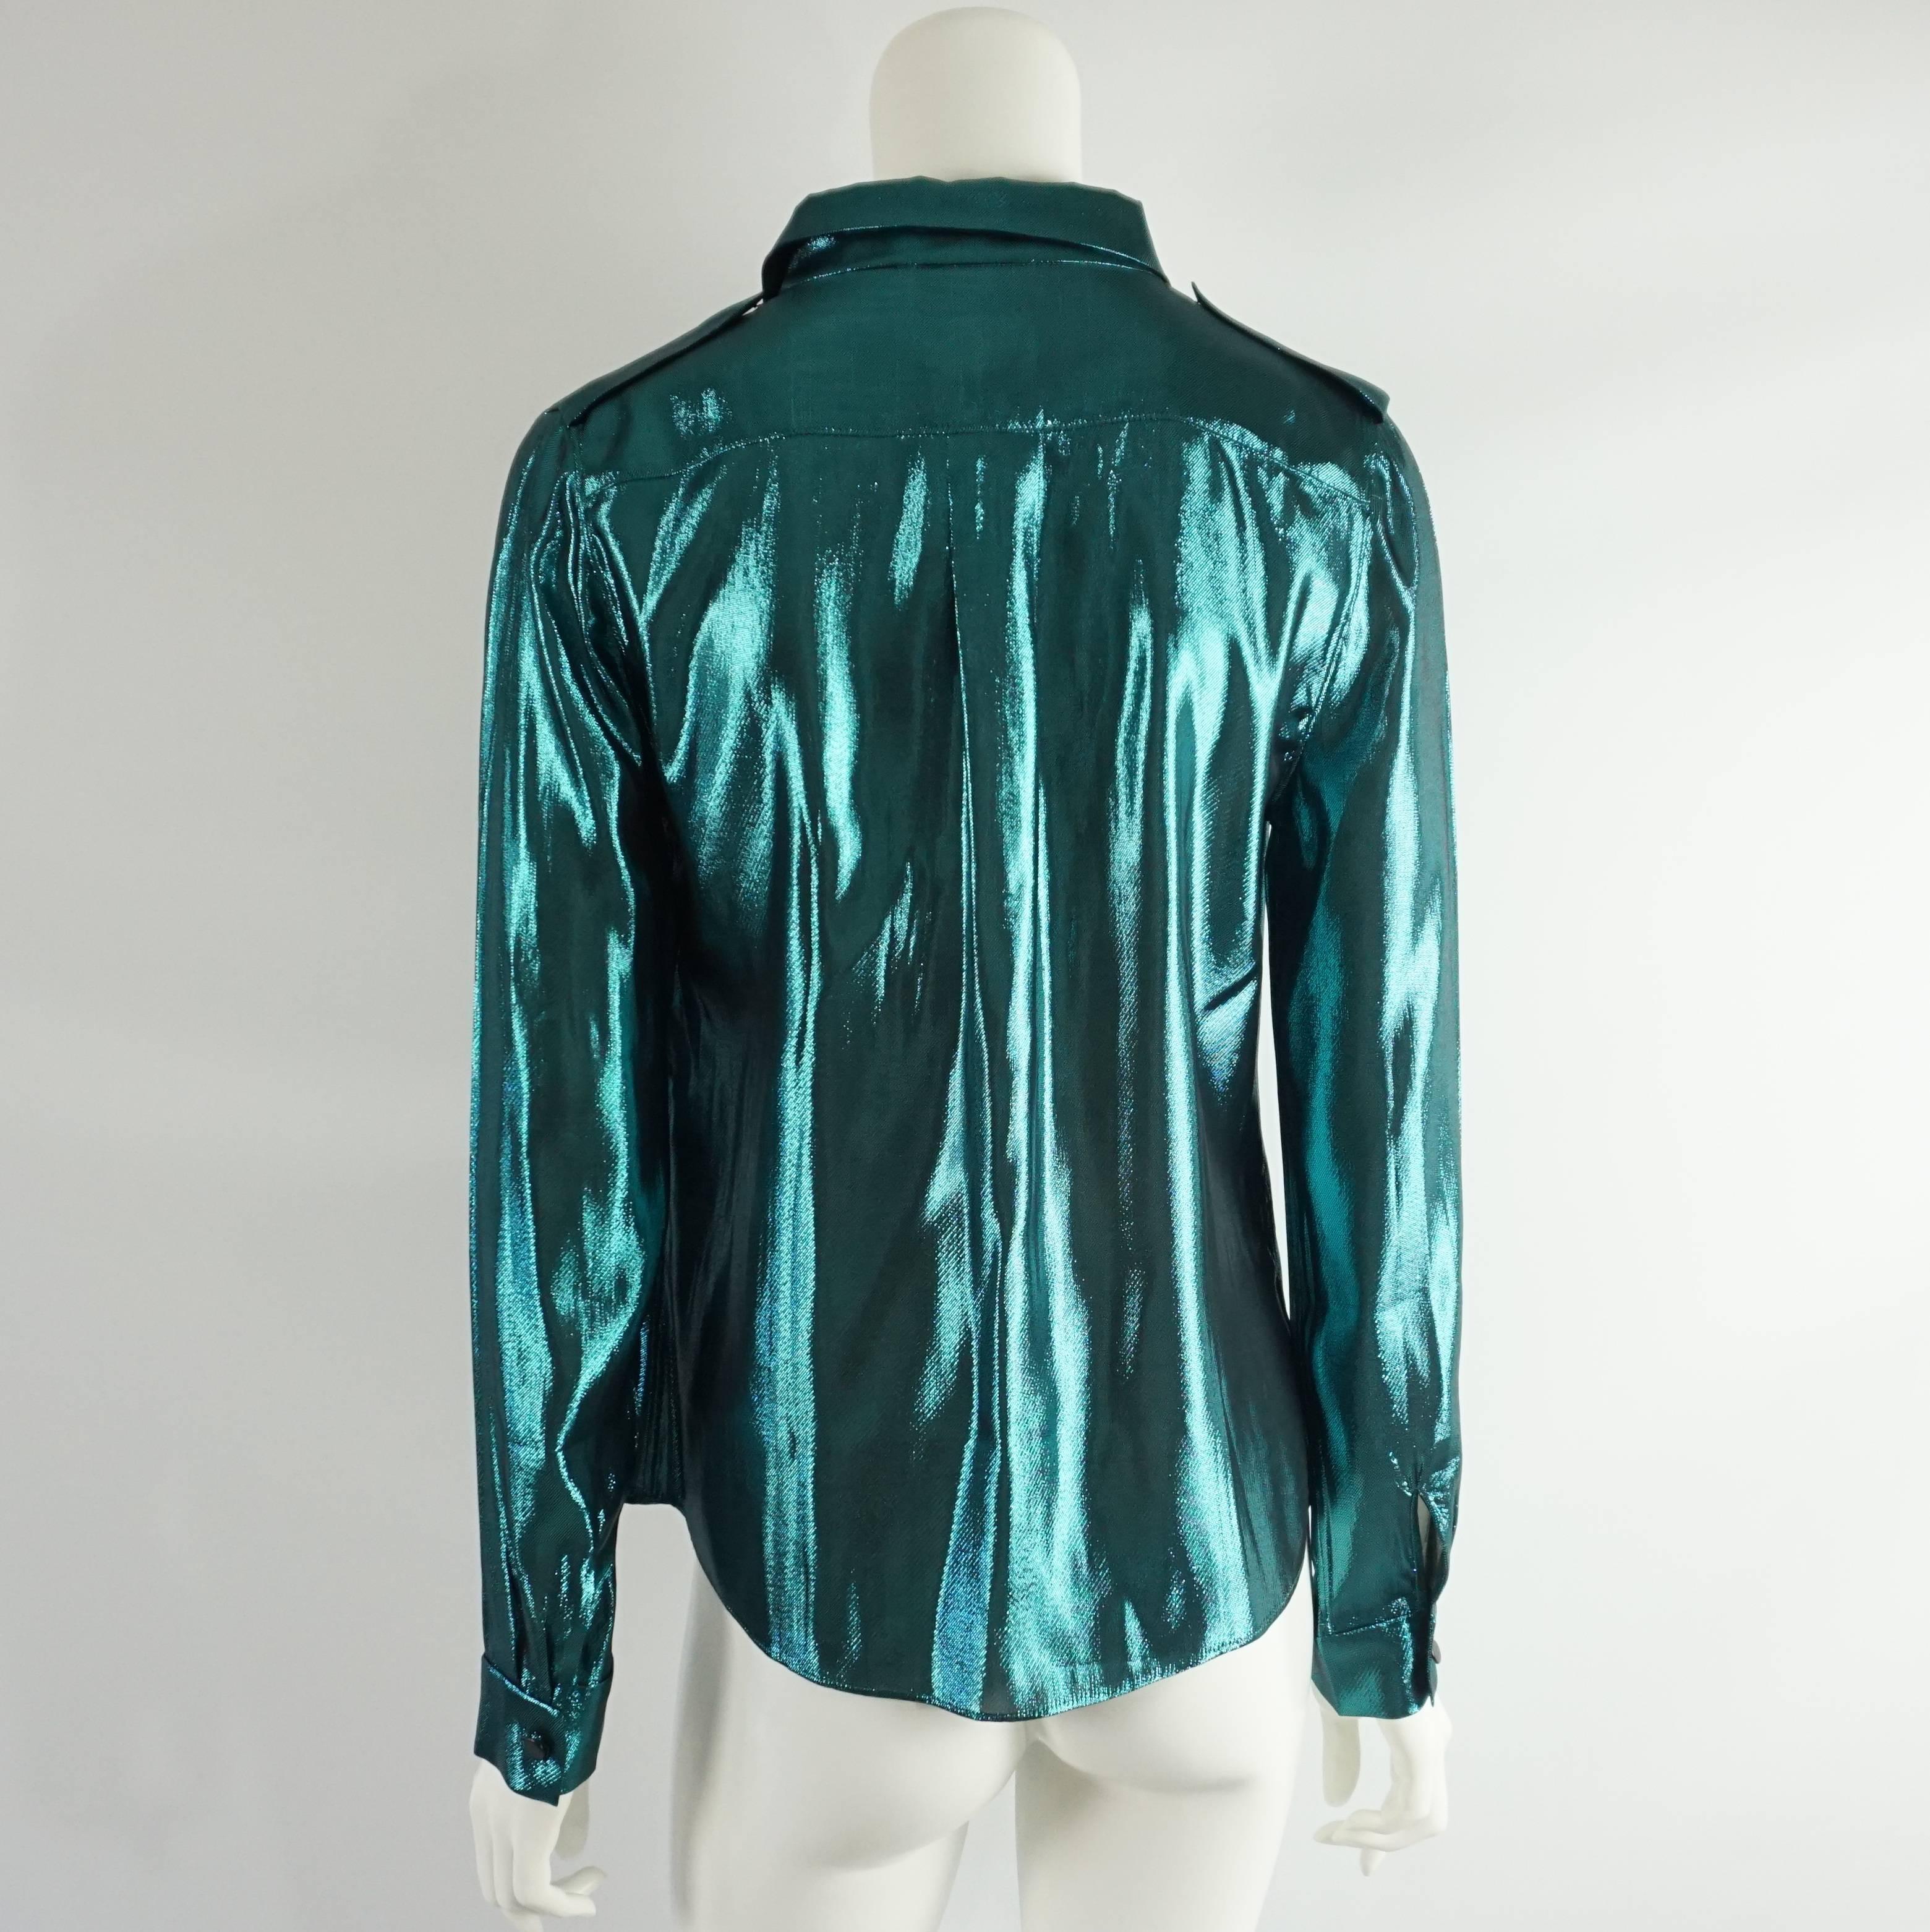 b8c4932ae2406 Lanvin Metallic Teal Silk Lame Button Down Shirt – 38 For Sale at 1stdibs